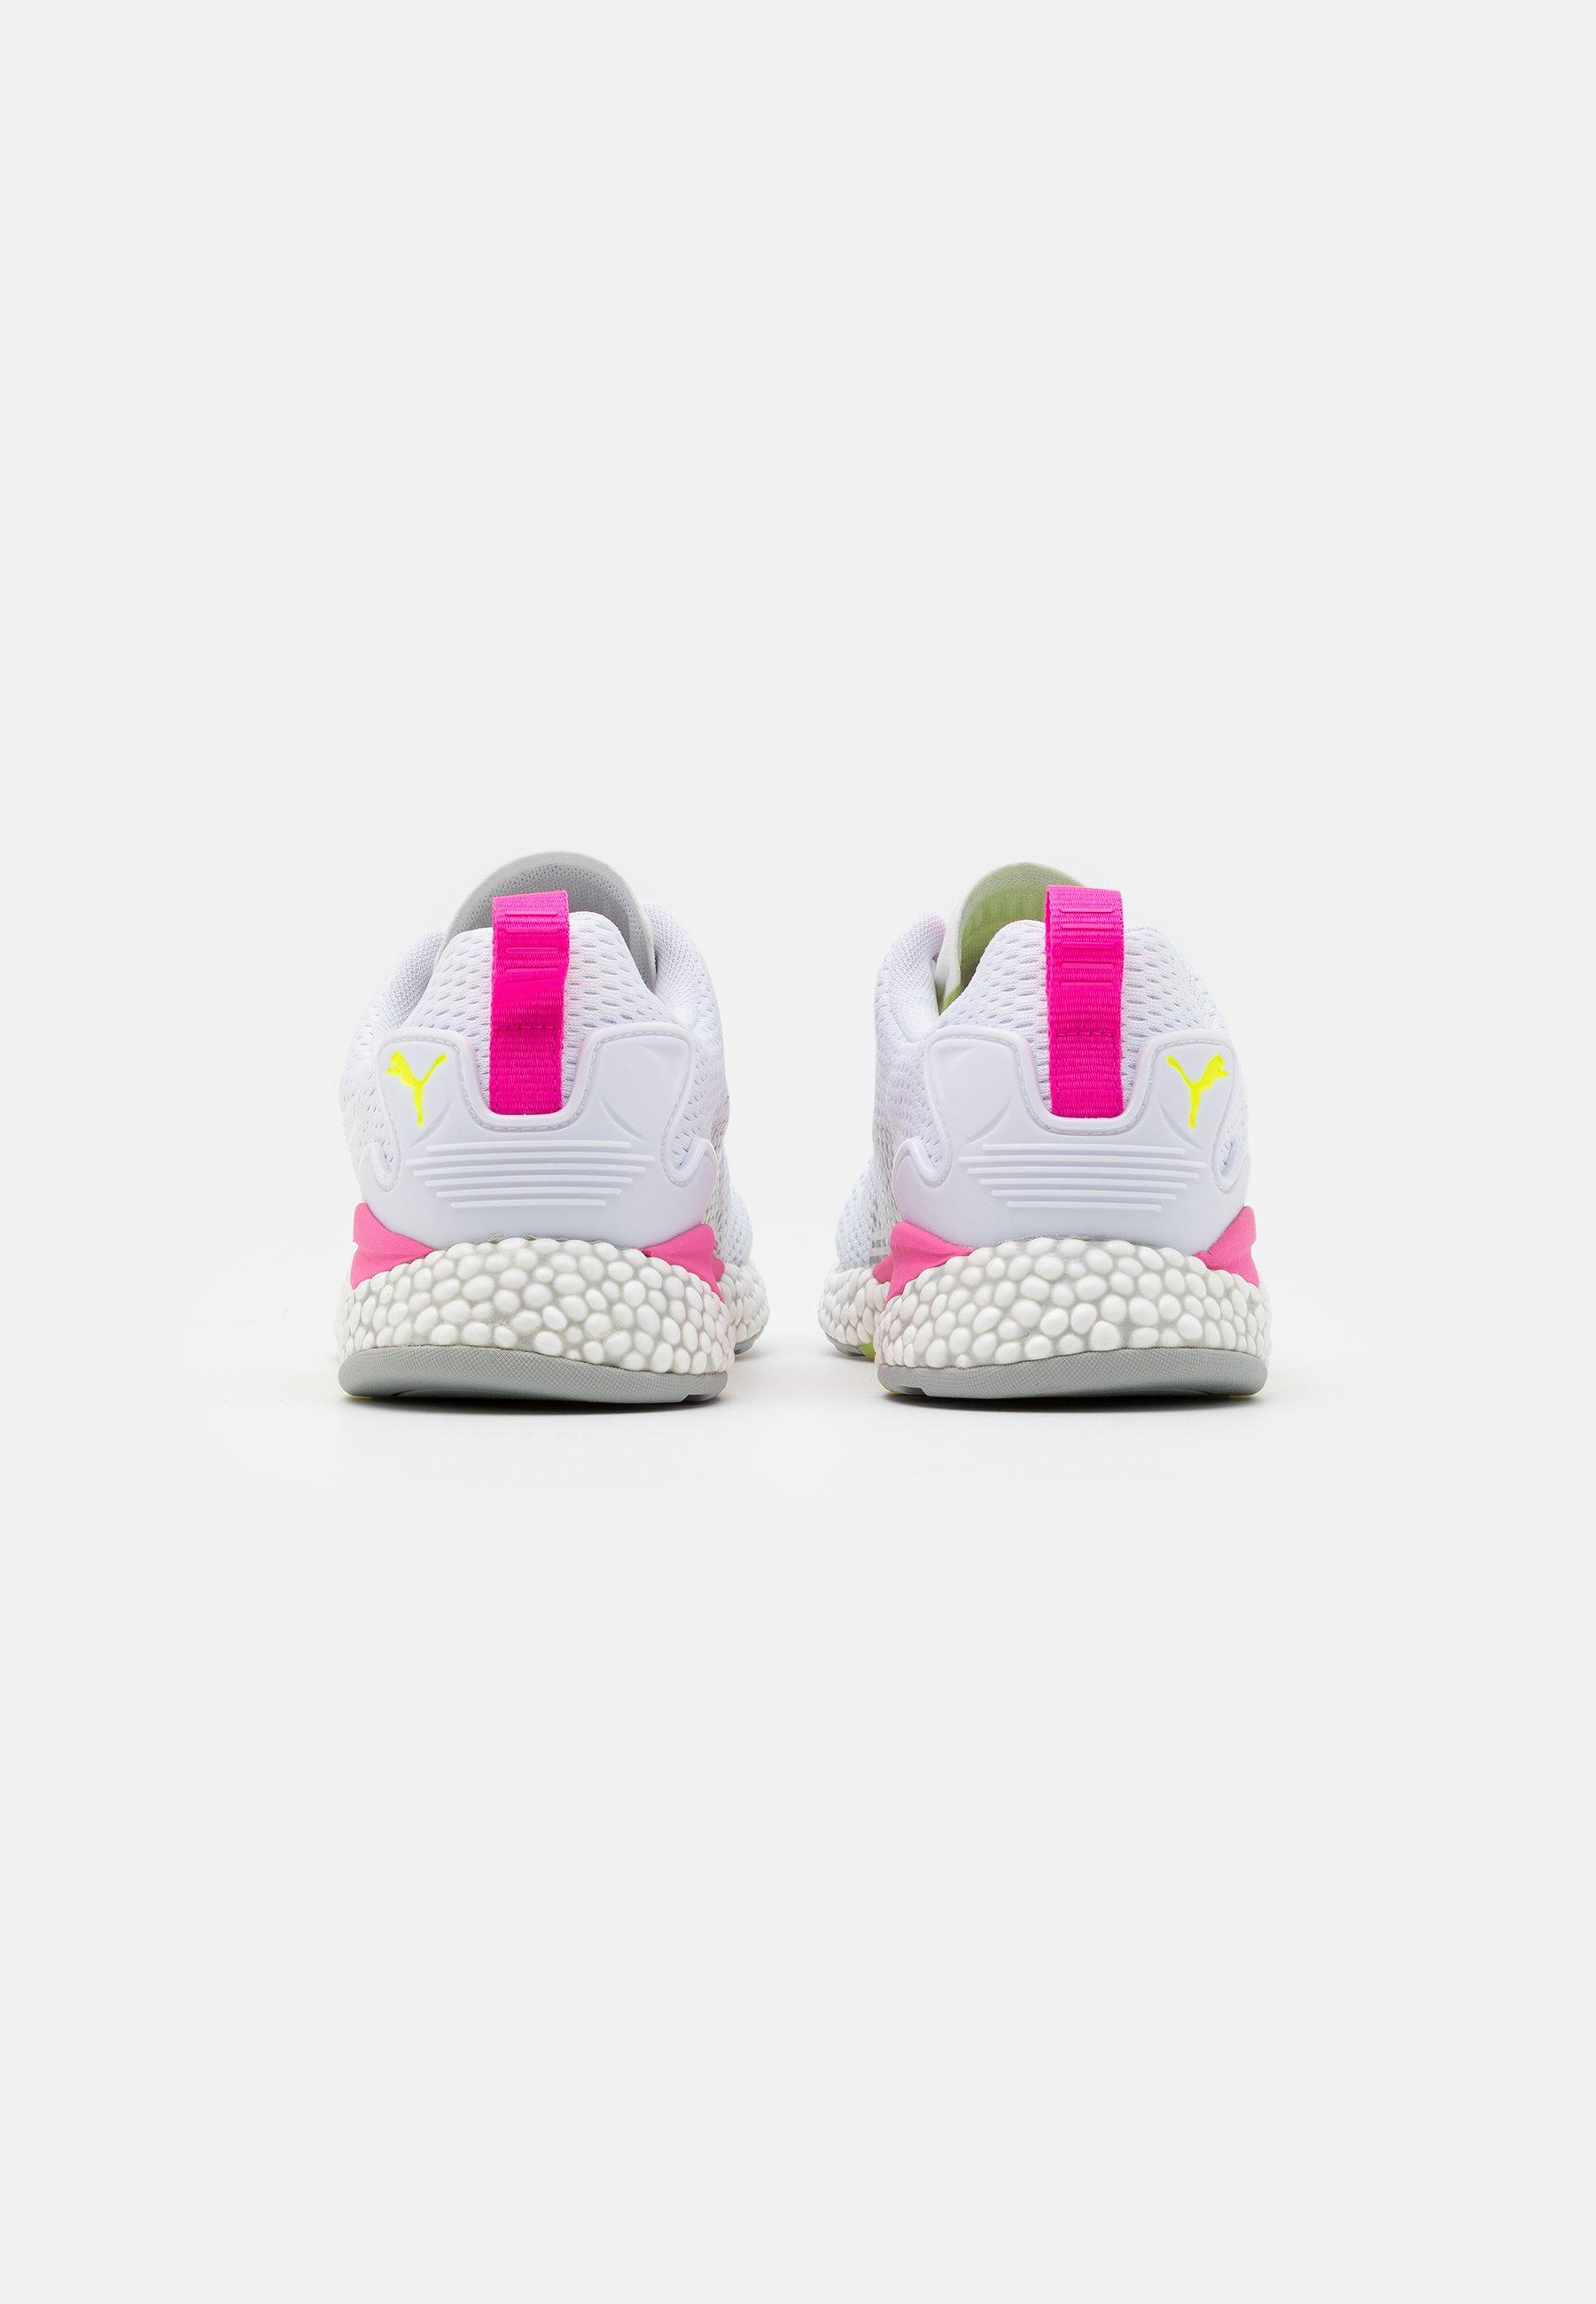 HYBRID RUNNER V2 Chaussures de running neutres whiteyellow alerthigh riseluminous pink